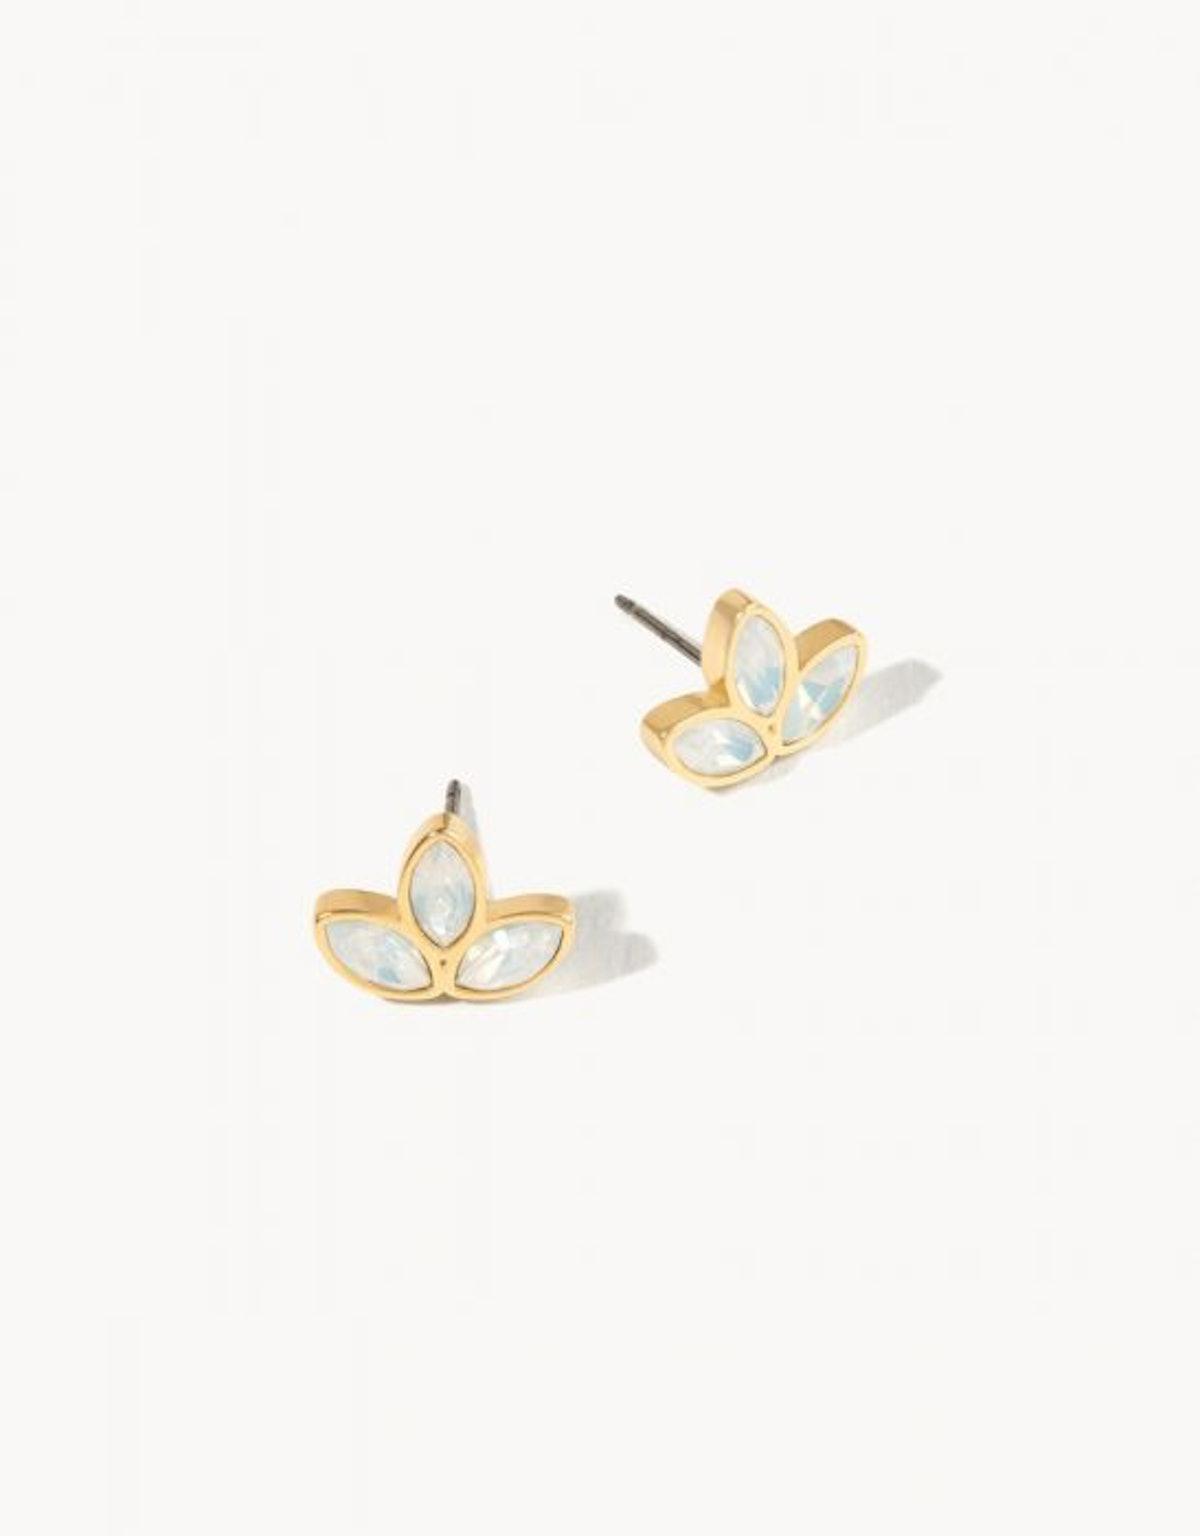 Spartina 449 Delicate Leaf Stud Earrings